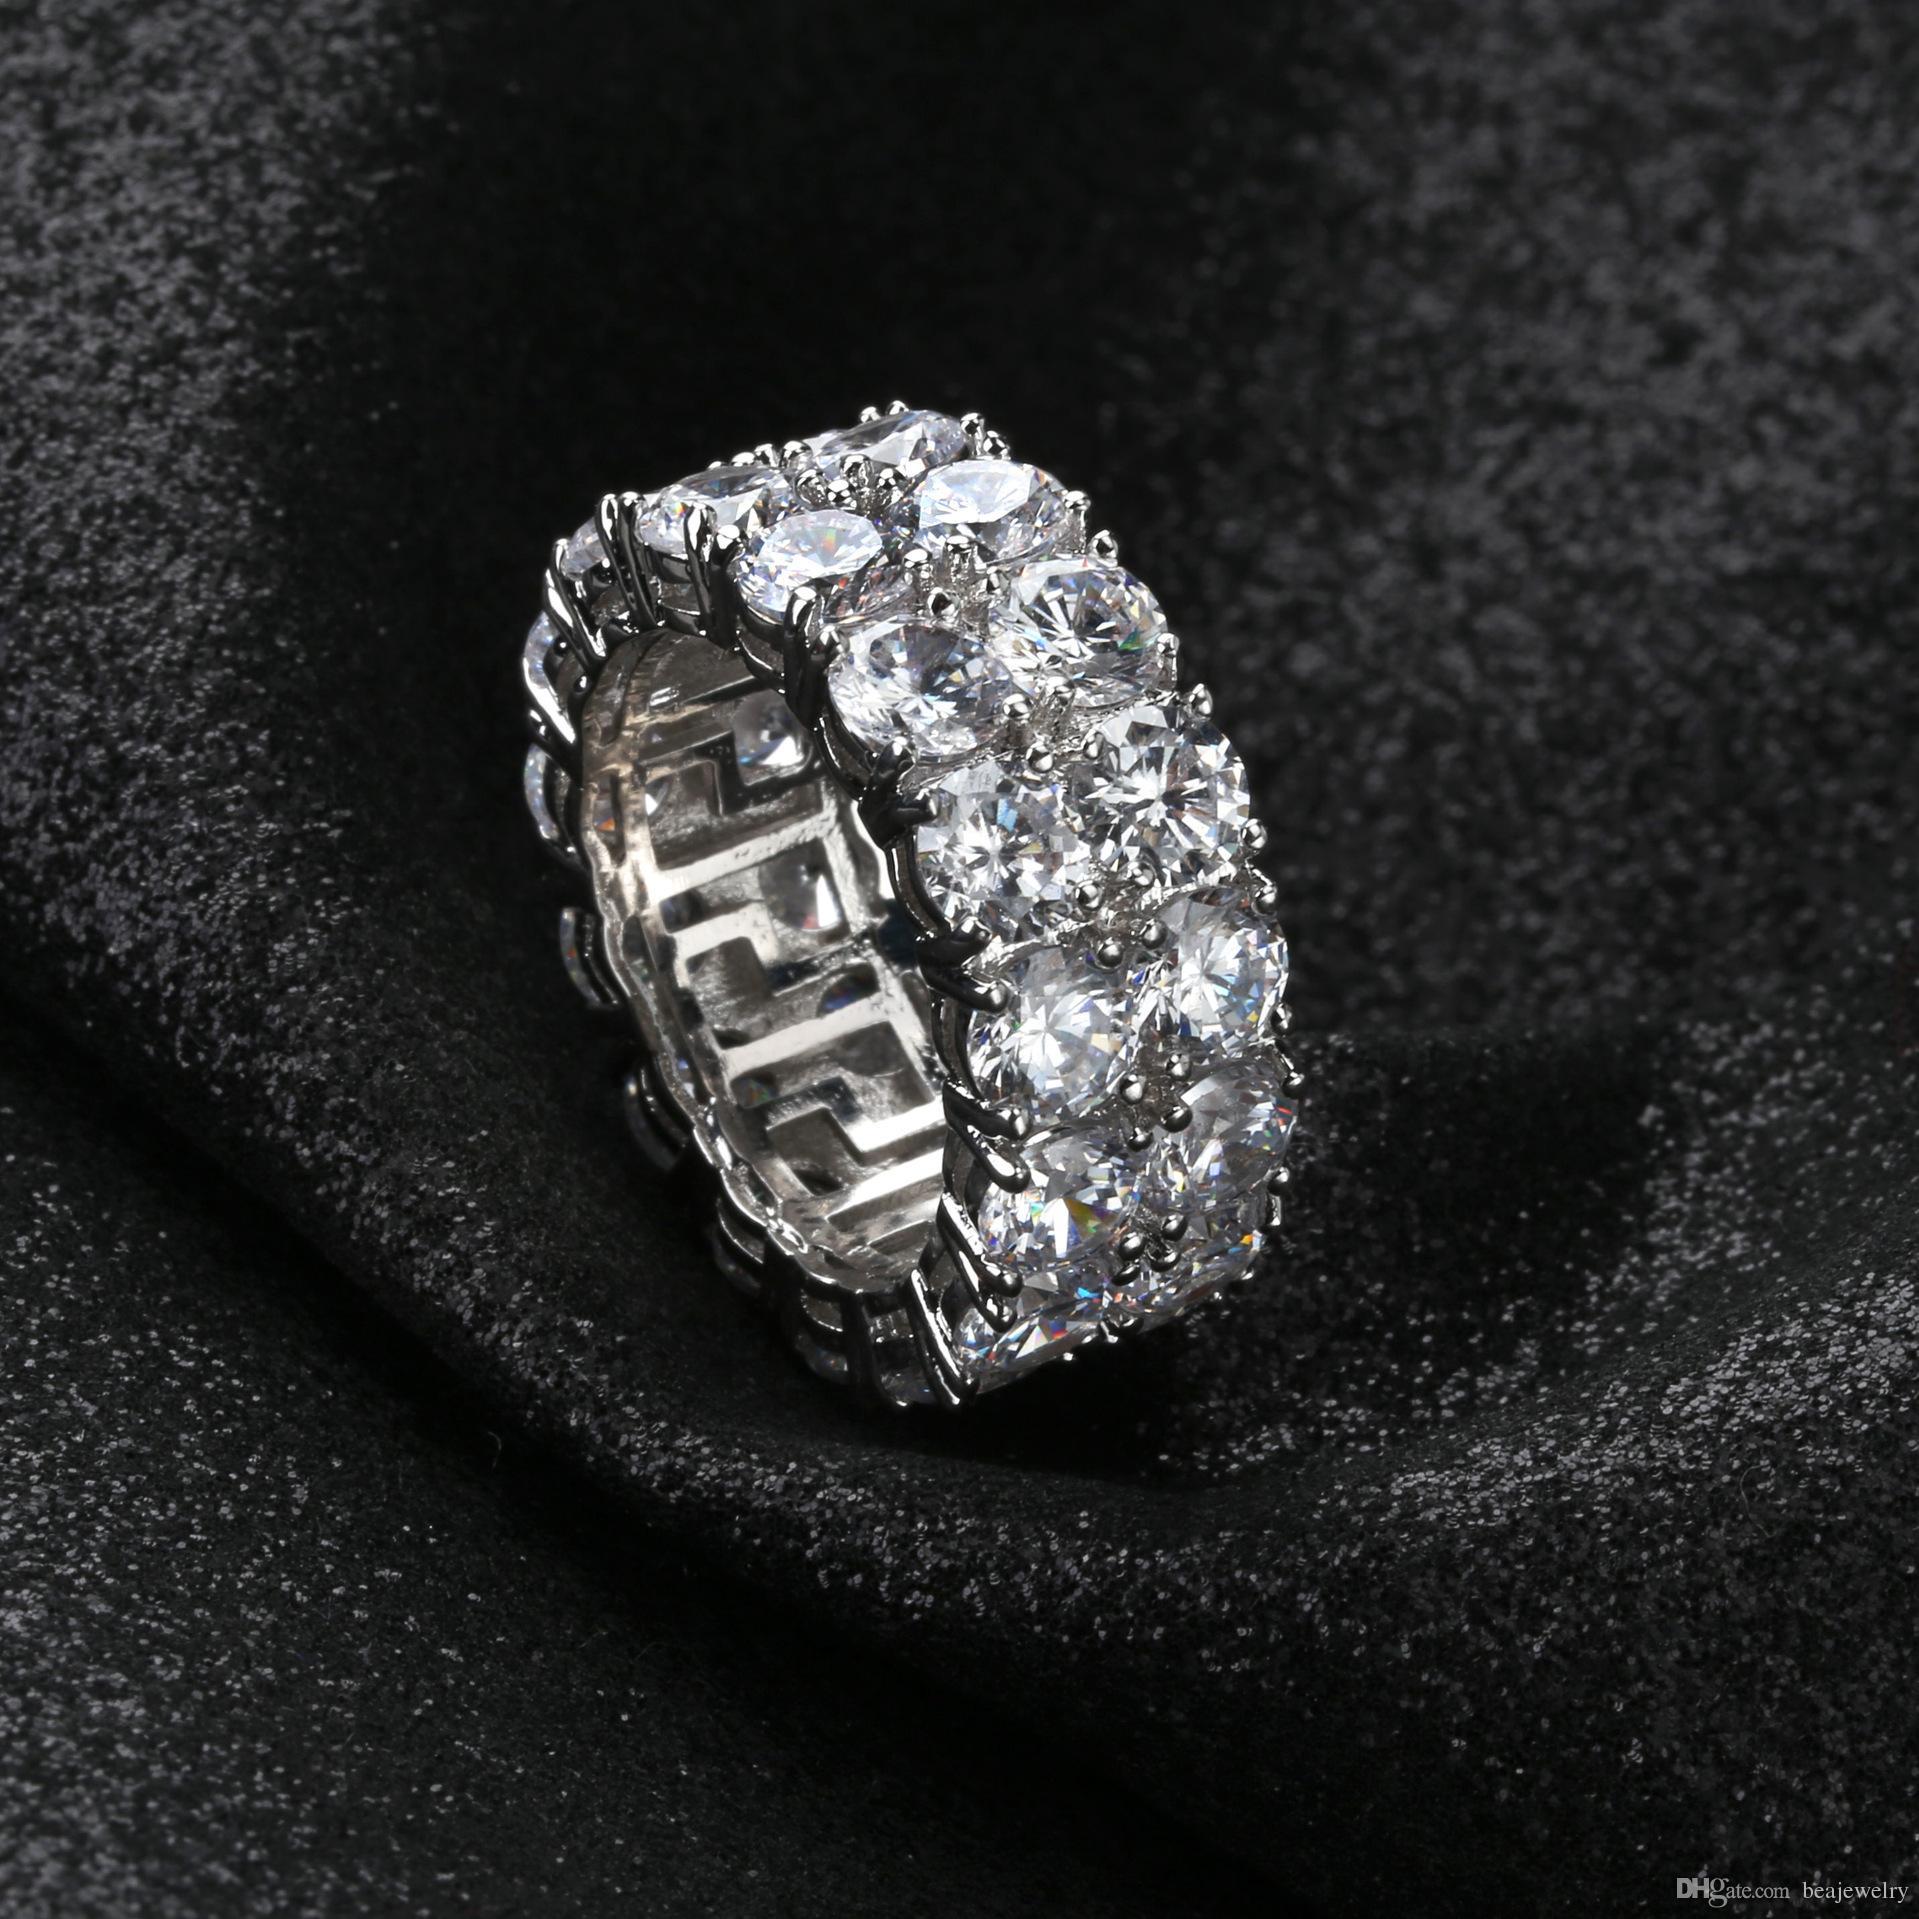 7-12 Gold Silber Farbe Überzogene Ringe Micro Gepflasterte 2 Reihe Tennisringe Zirkon Hip Hop Fingerring Für Männer Frauen